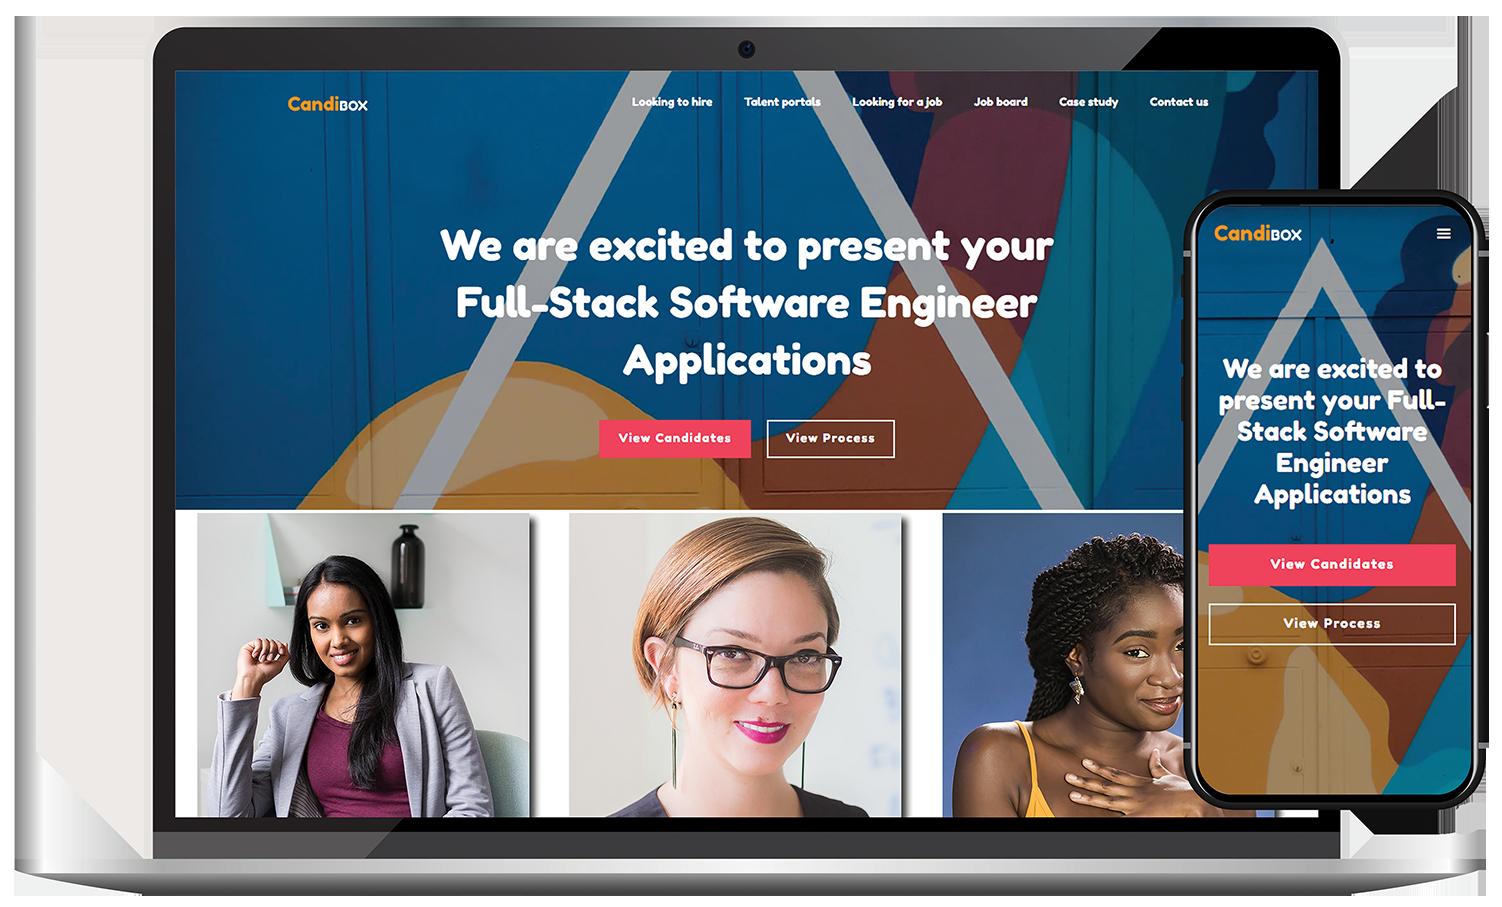 Recruitment Platform Talent Applicant Tracking System